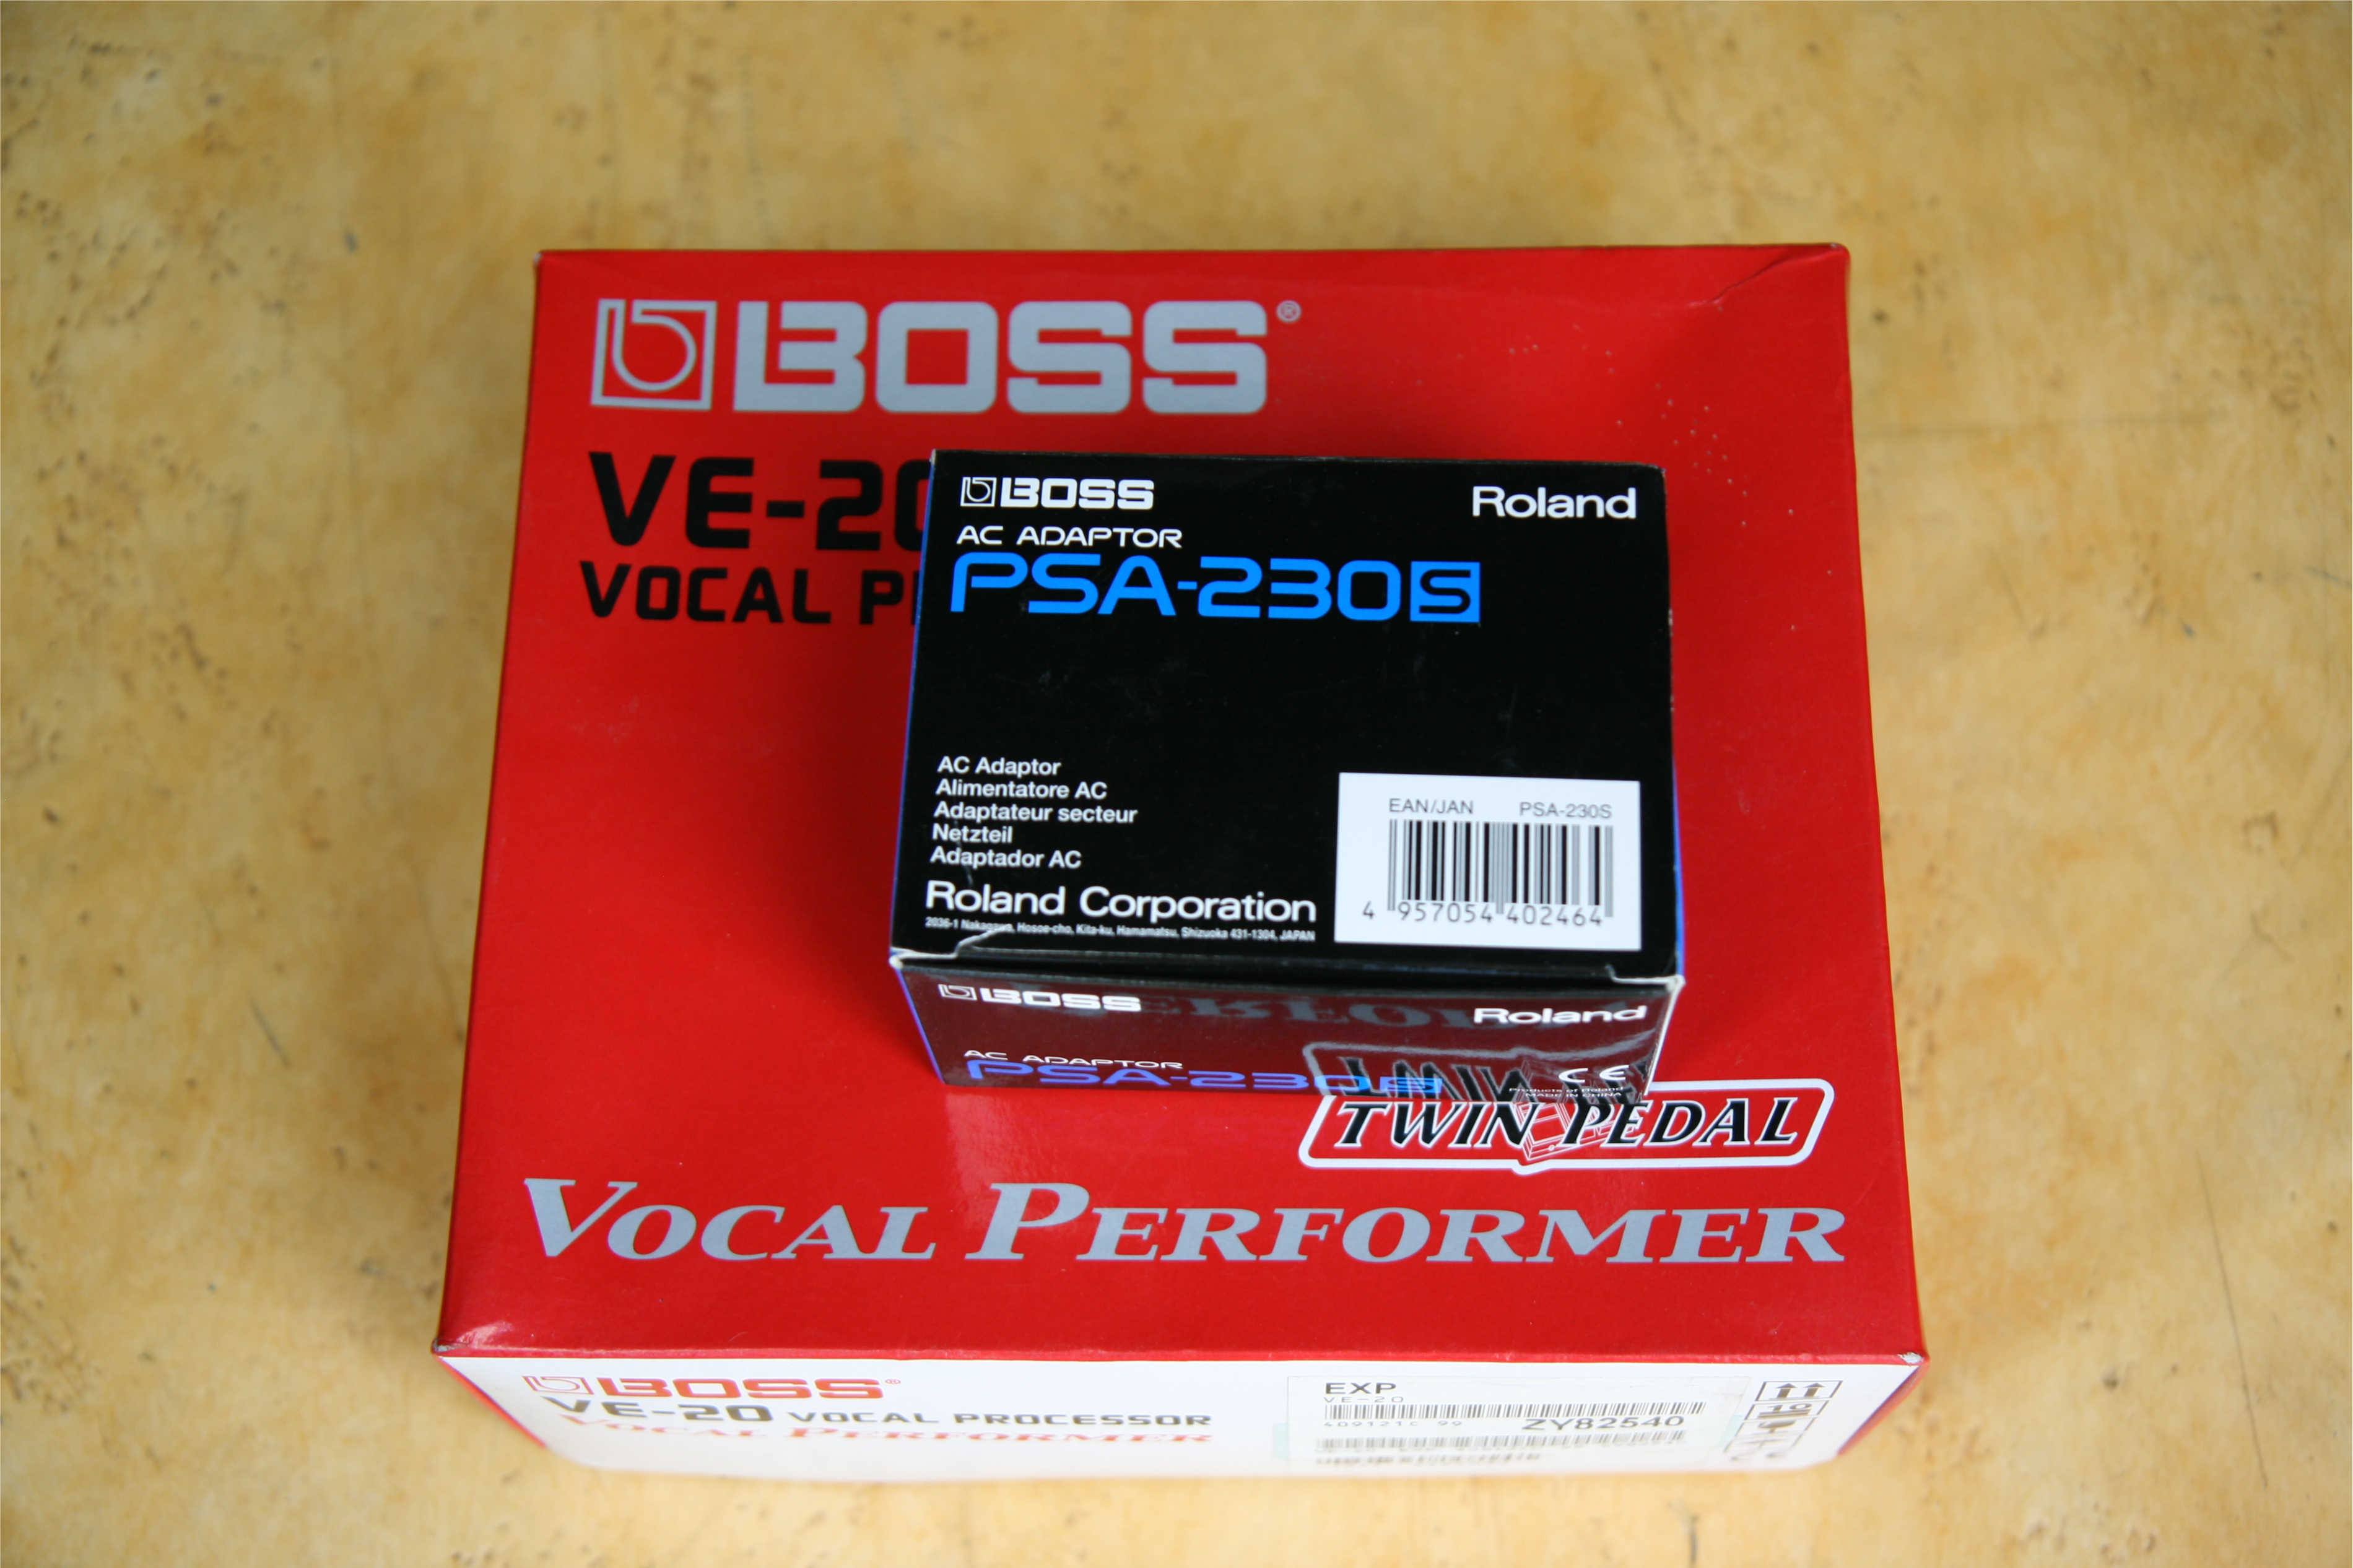 boss ve 20 vocal performer manual pdf